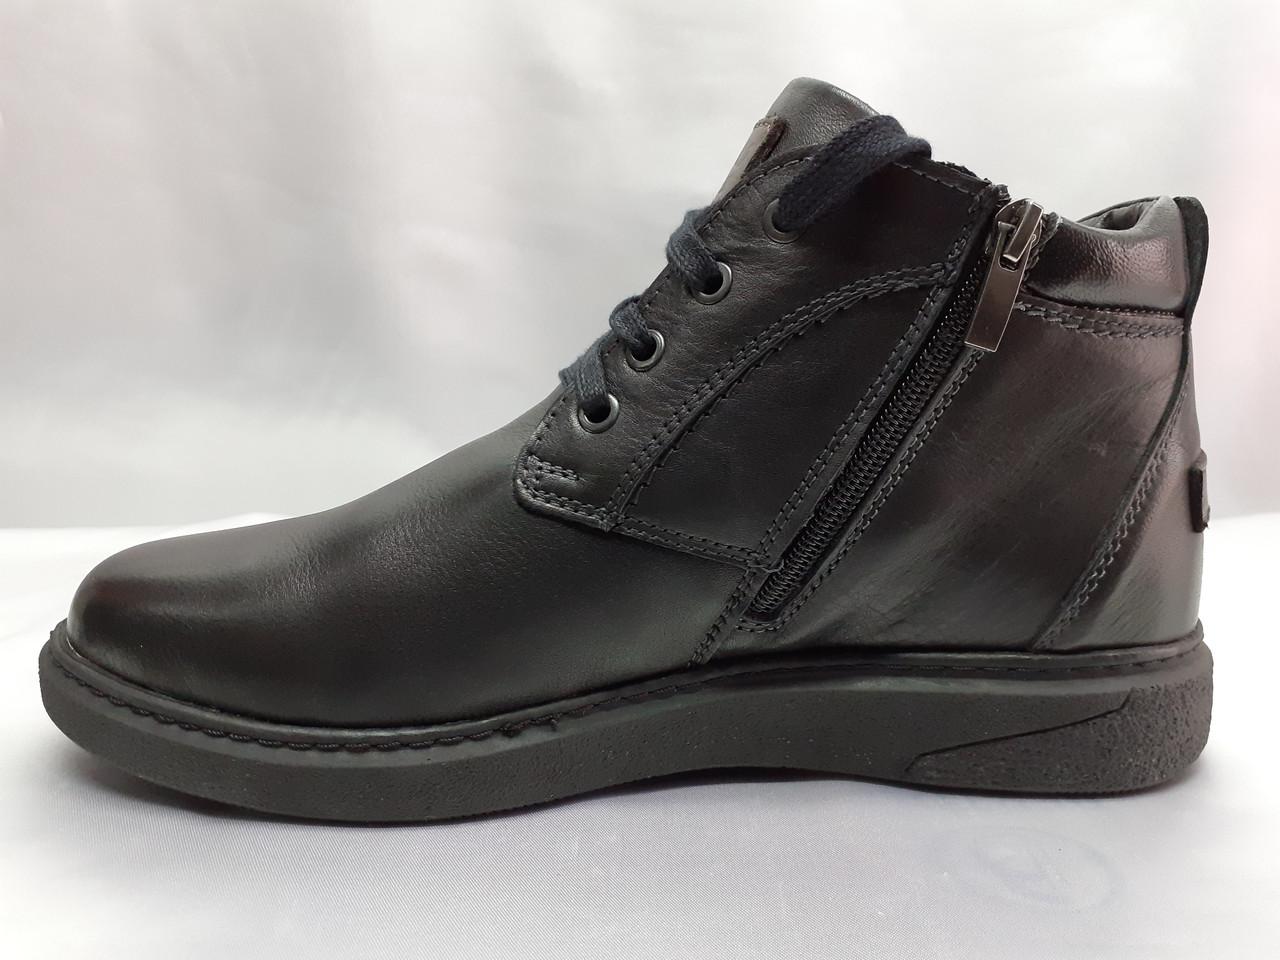 Мужские зимние полуботинки-ботинки на цигейке Detta